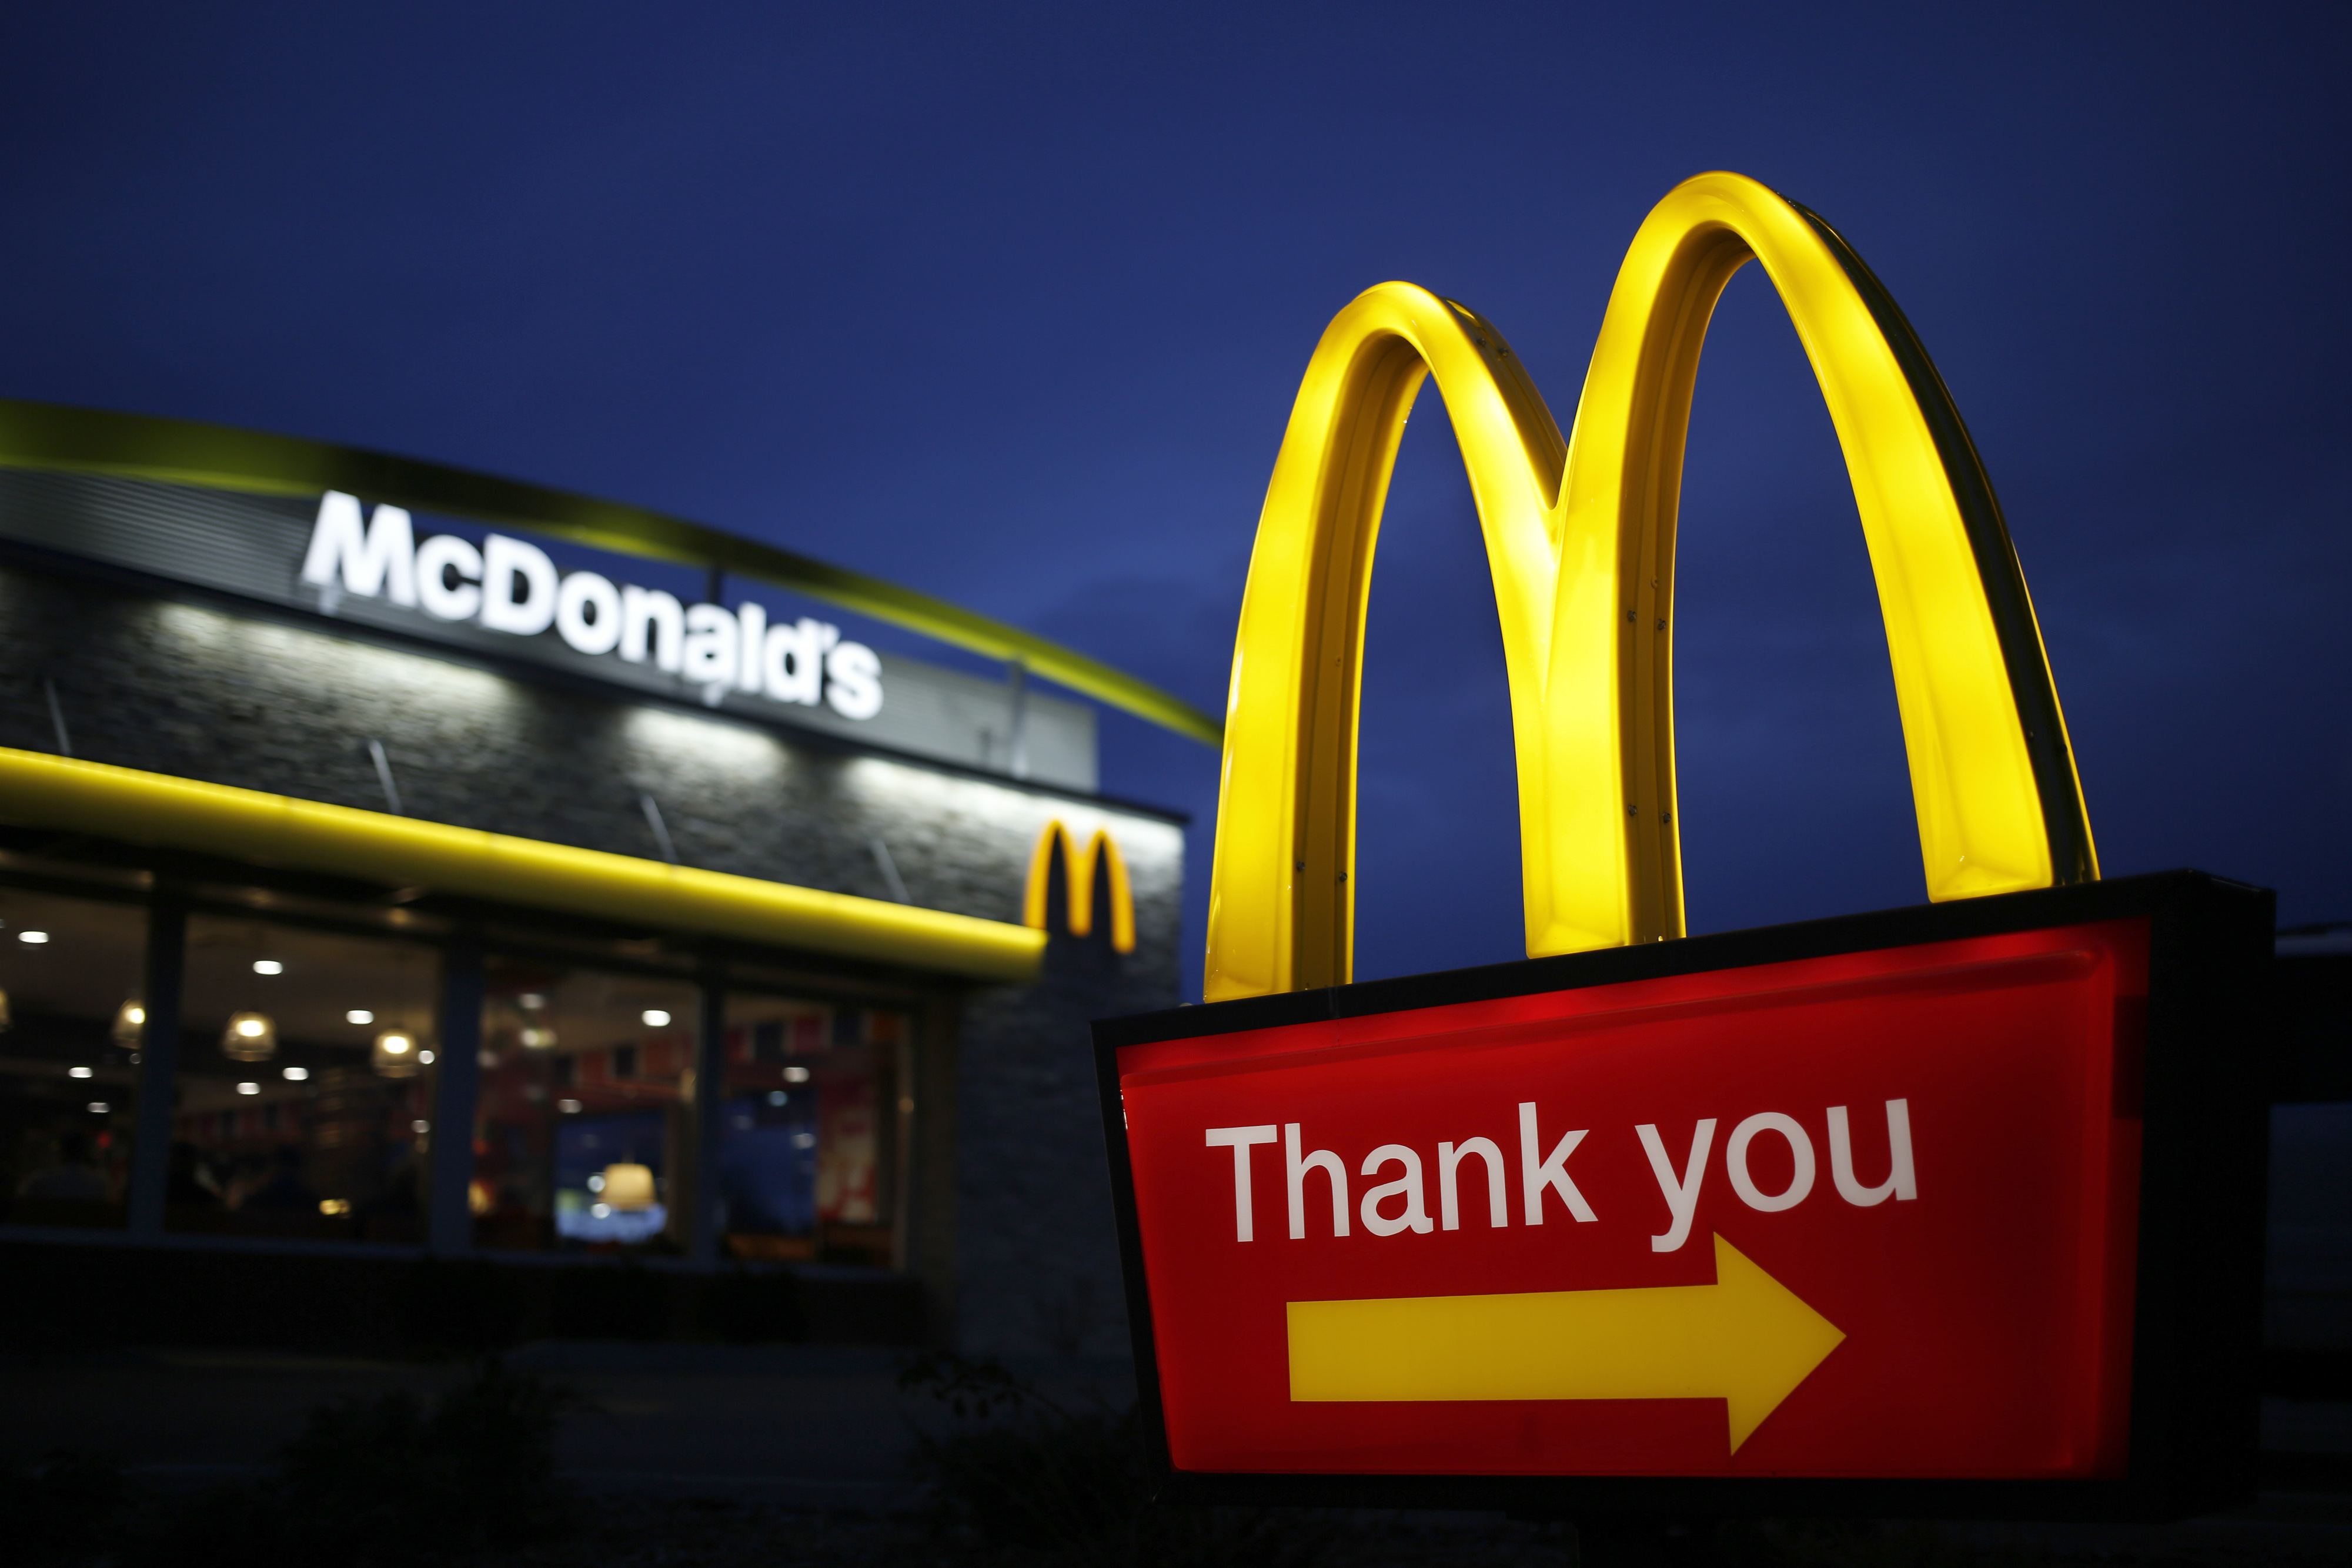 McDonald's Same-Store Sales Top Estimates as Declines Abate